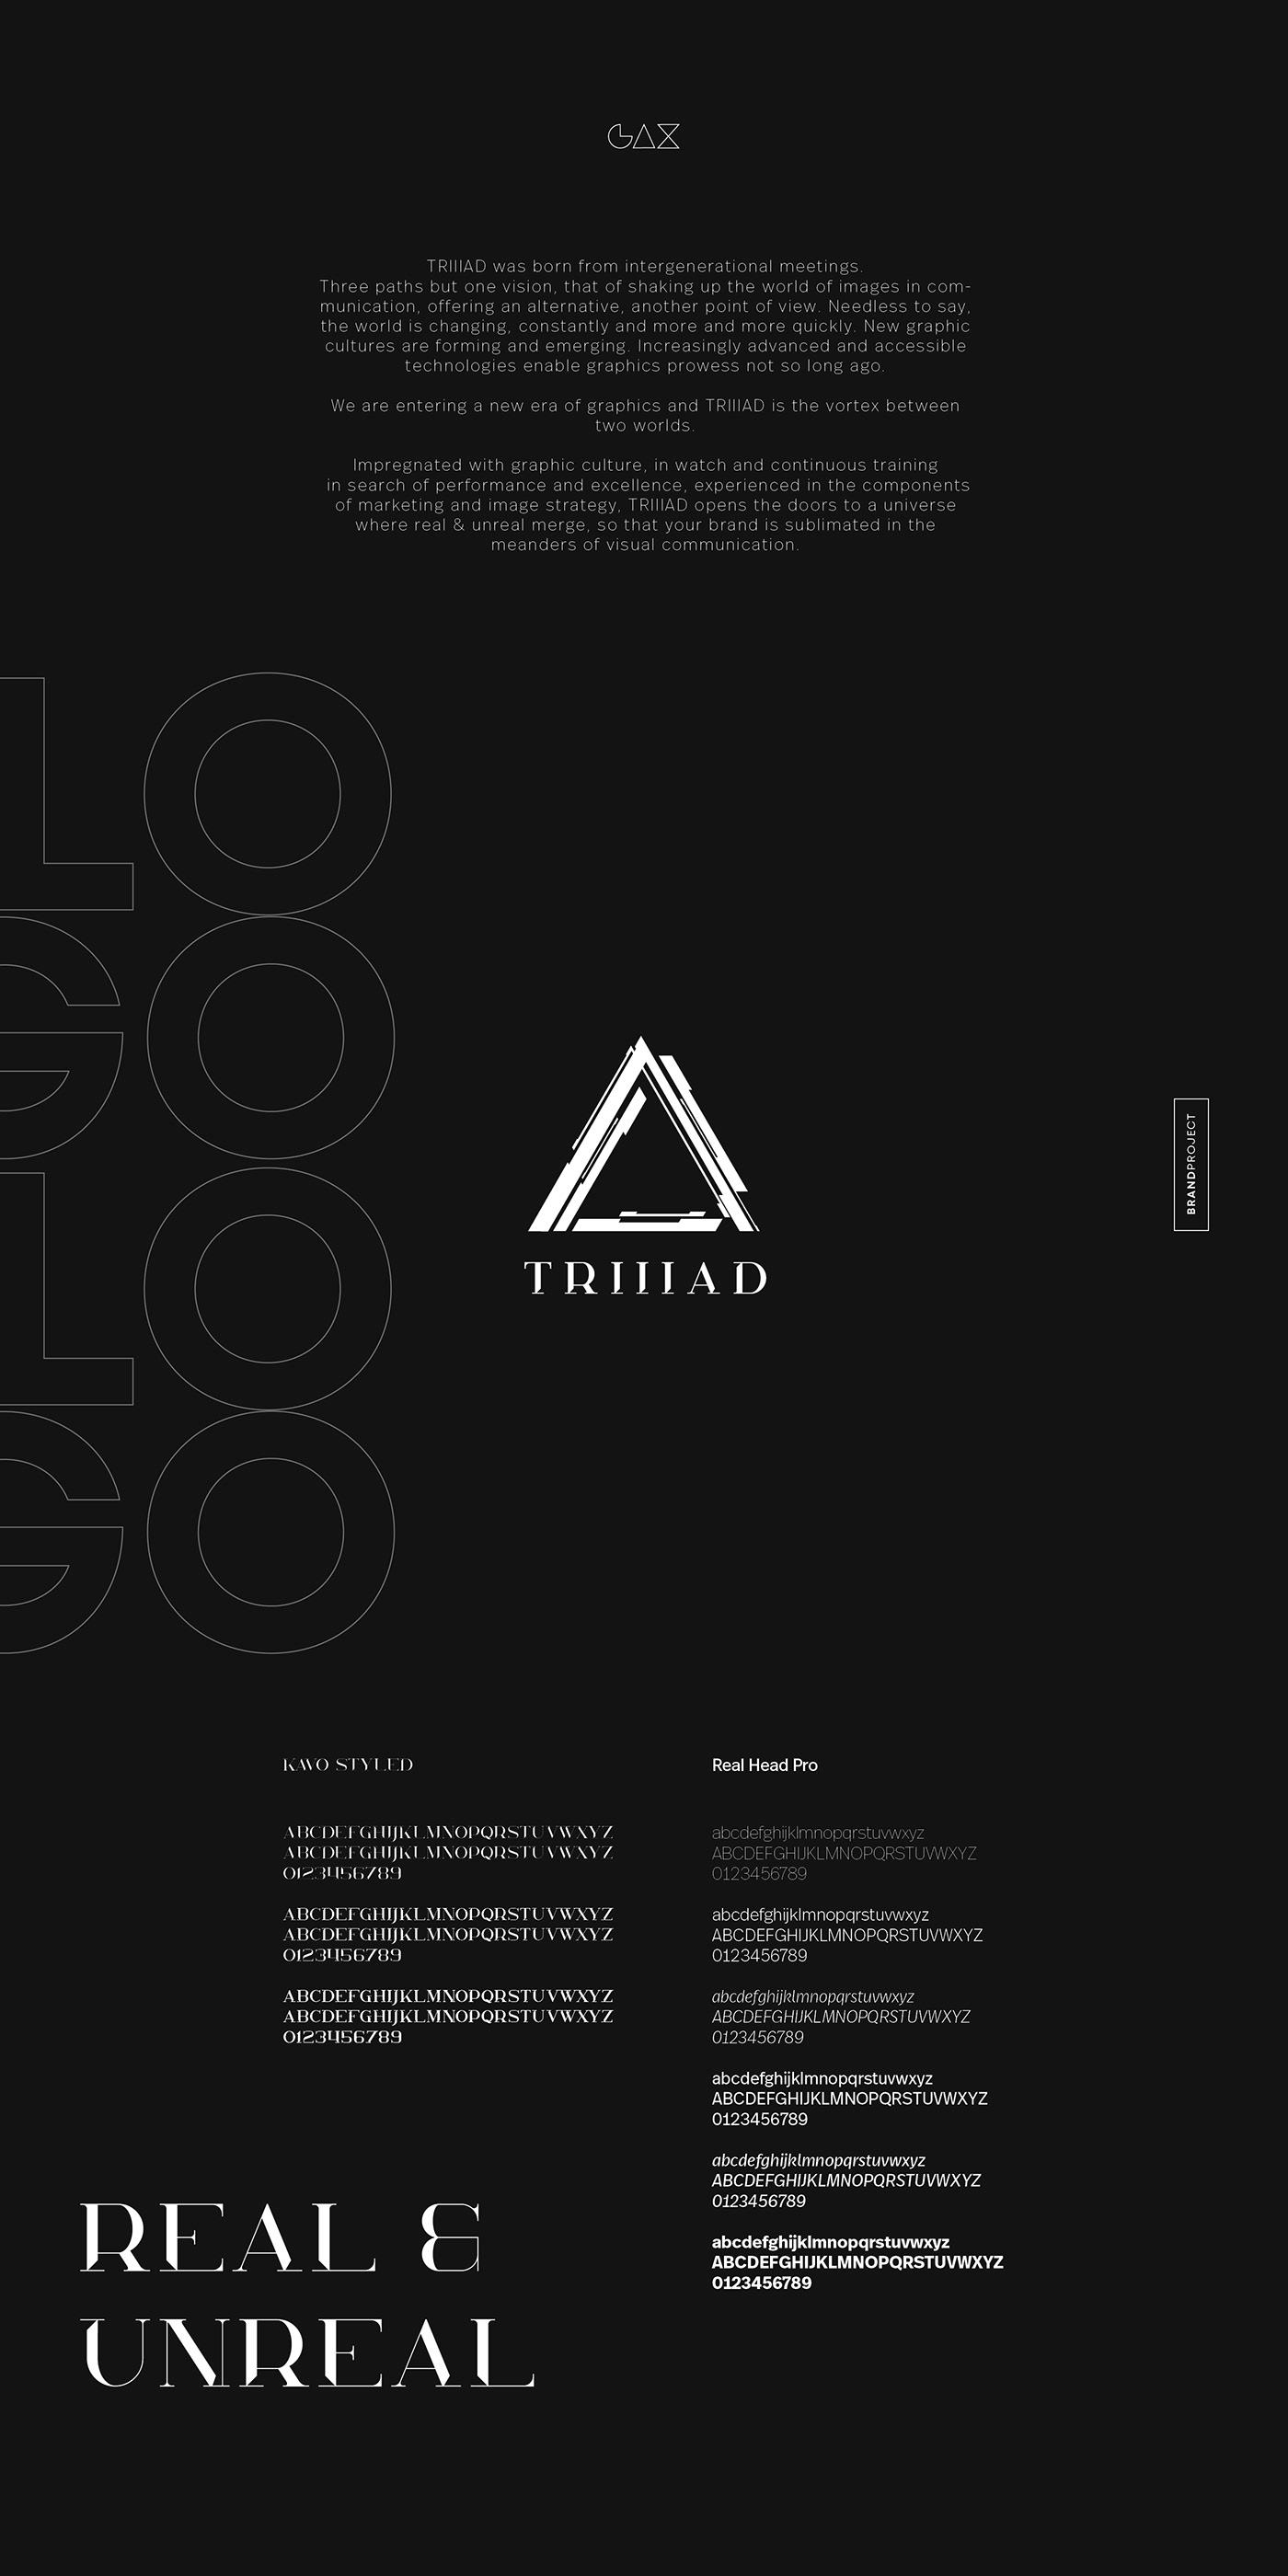 3D Aniamtion black mood brand branding  graphism identité visuelle logo Logotype tech